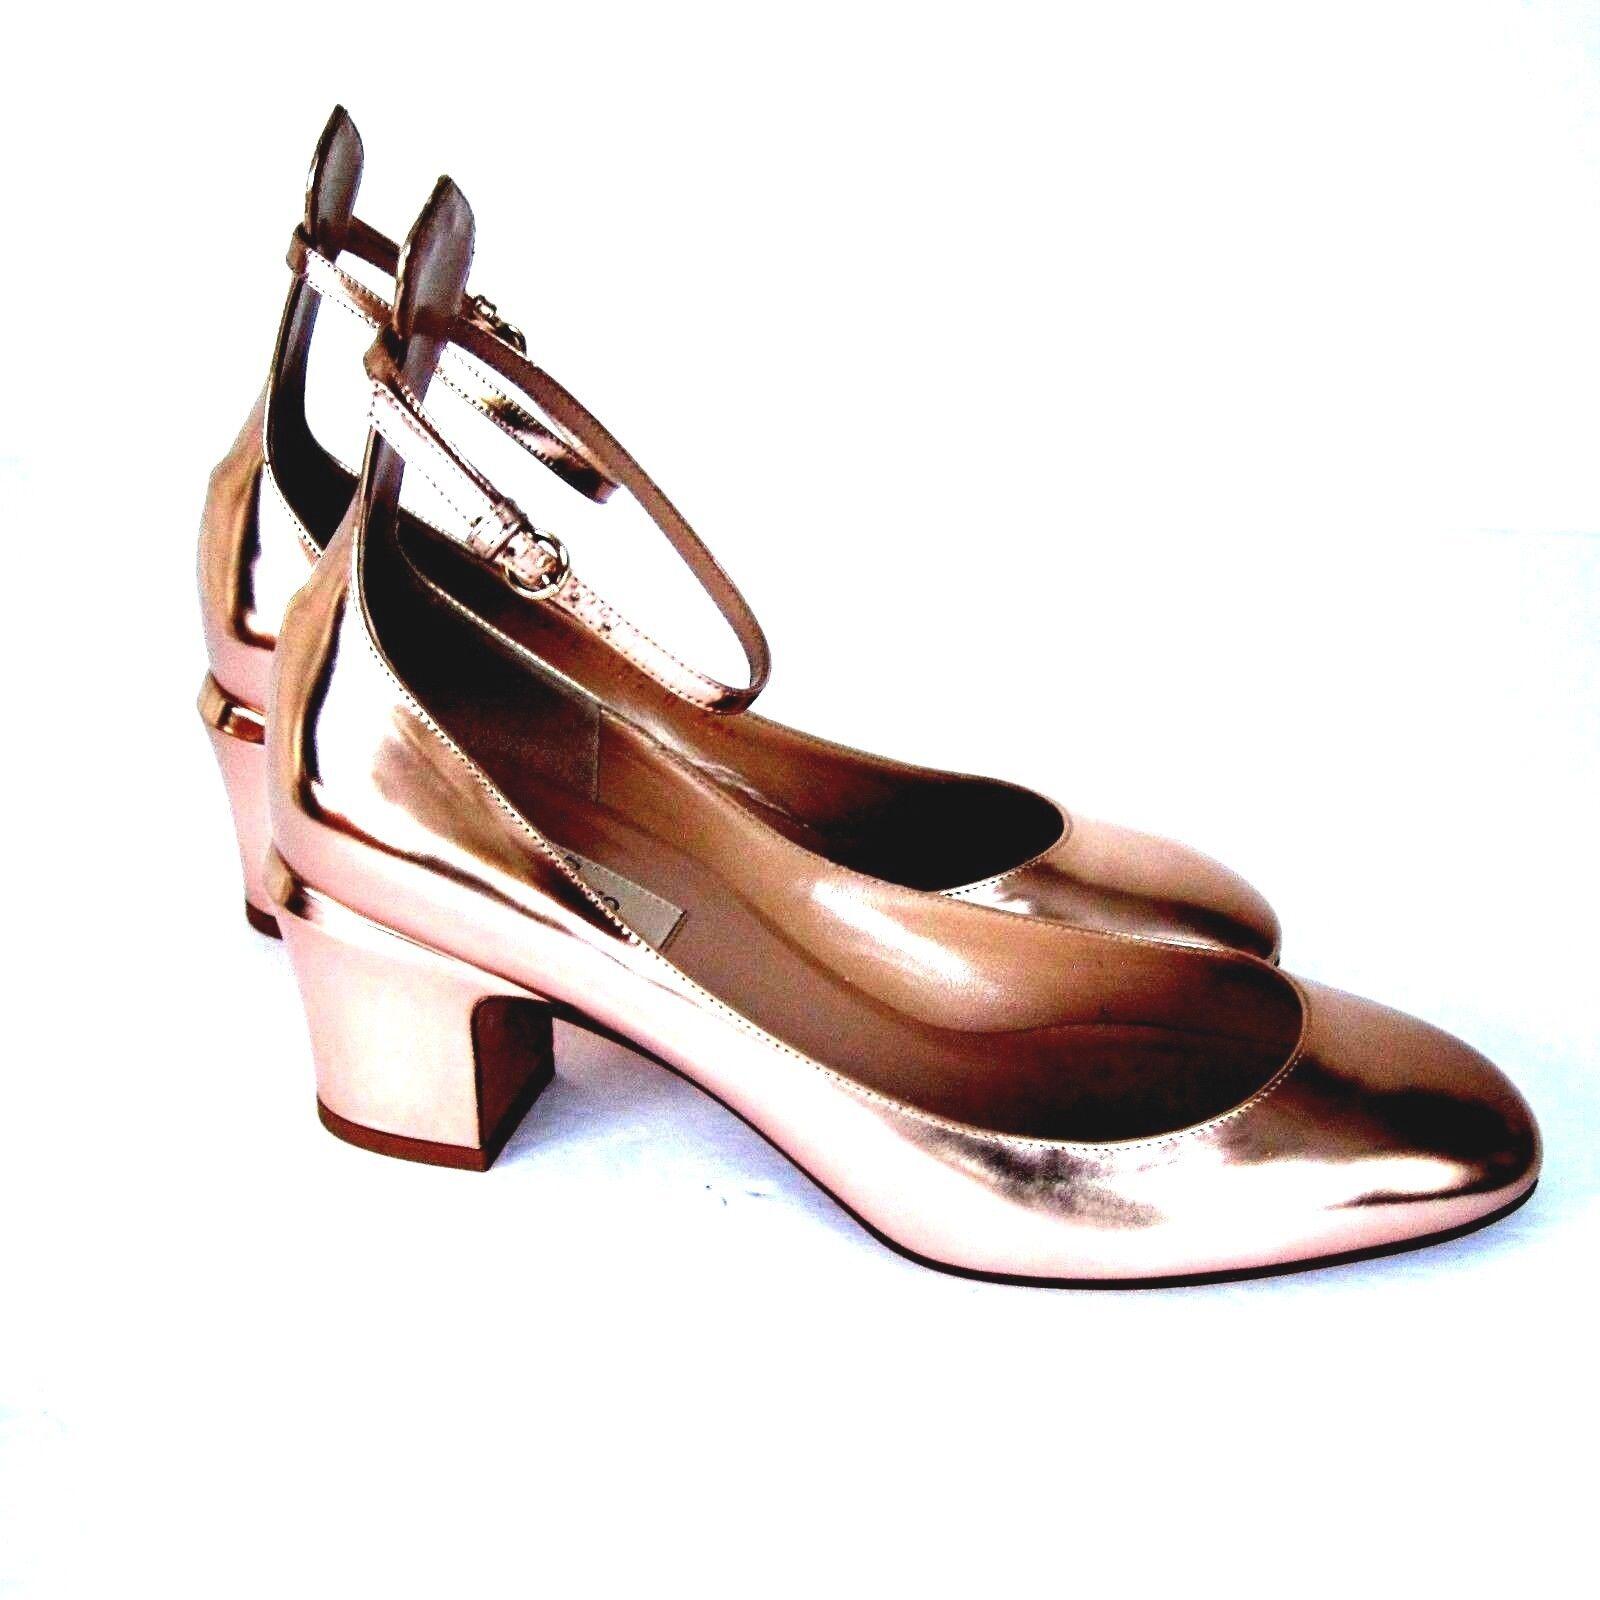 J-2879102 VALENTINO GARAVANI cuivre Tango Escarpins Chaussures Taille US 9 marqué 39